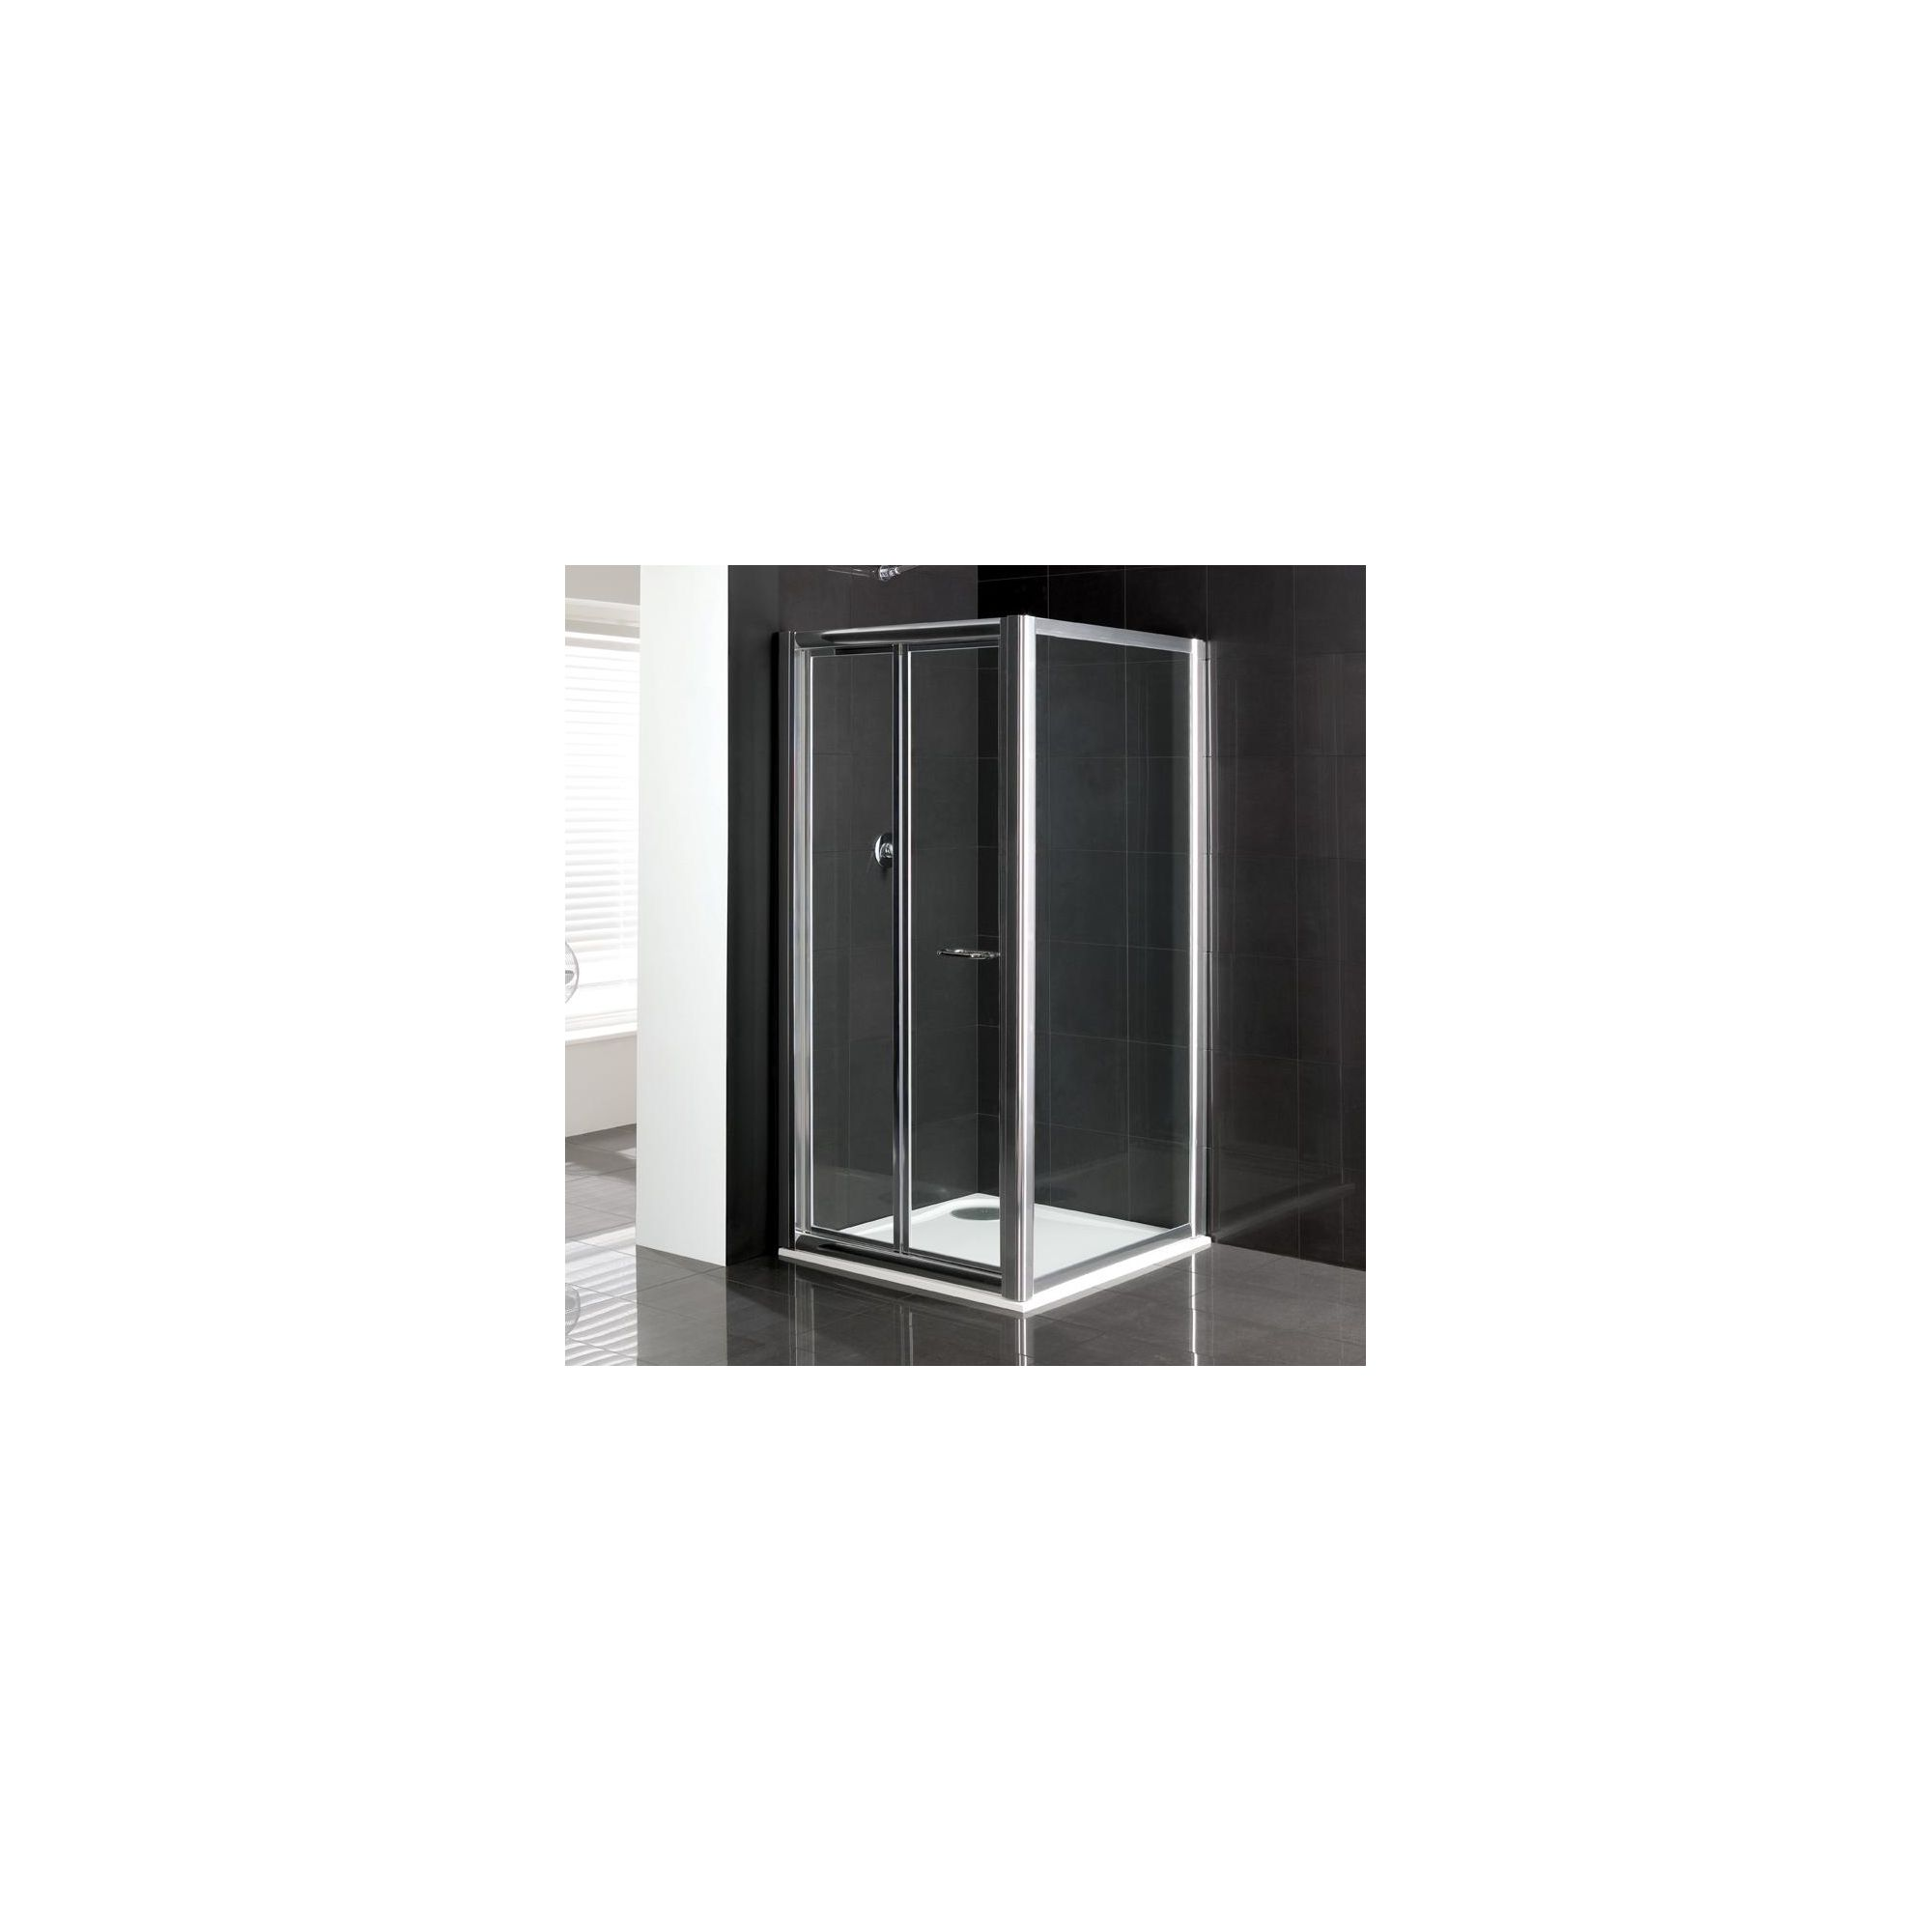 Duchy Elite Silver Bi-Fold Door Shower Enclosure with Towel Rail, 800mm x 800mm, Standard Tray, 6mm Glass at Tesco Direct